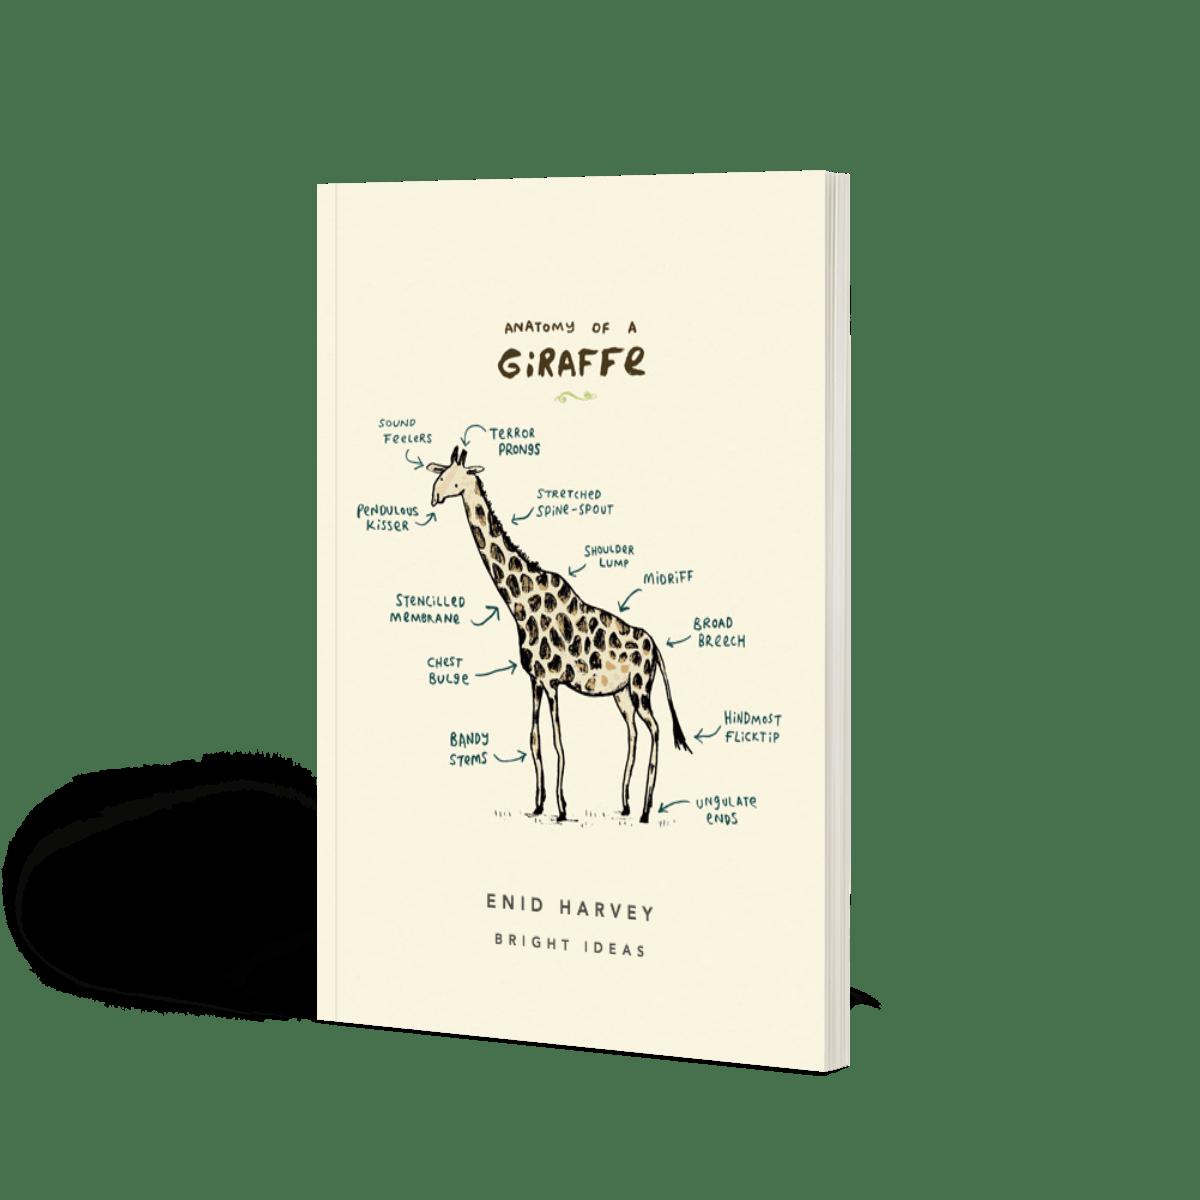 Https%3a%2f%2fwww.papier.com%2fproduct image%2f10054%2f6%2fanatomy of a giraffe 2556 avant 1470655107.png?ixlib=rb 1.1